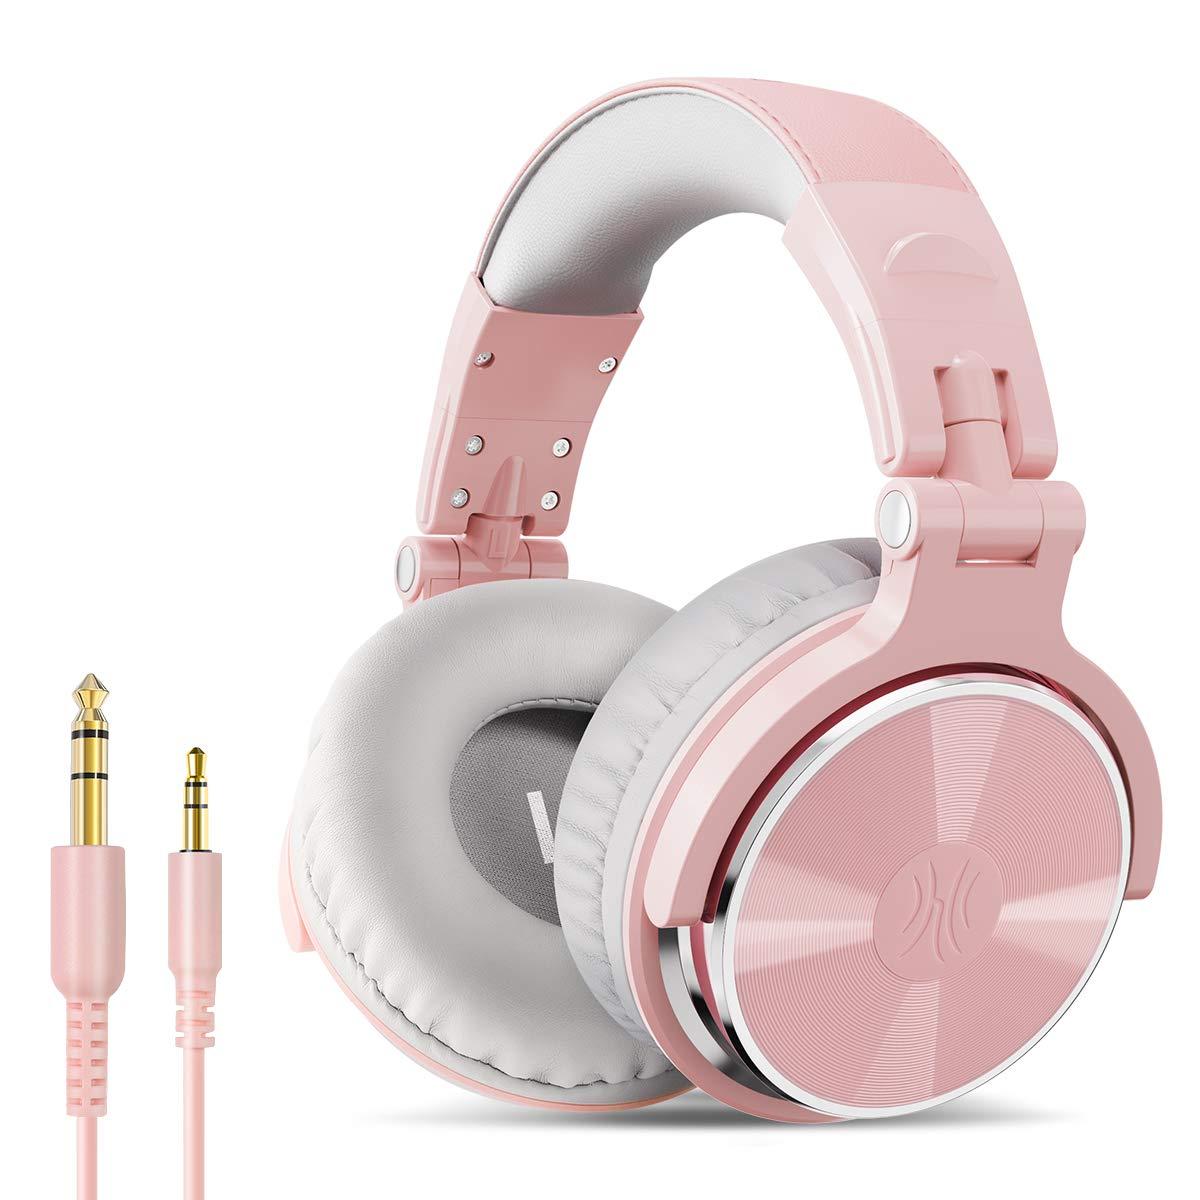 OneOdio Pro-10 Over Ear Headphone